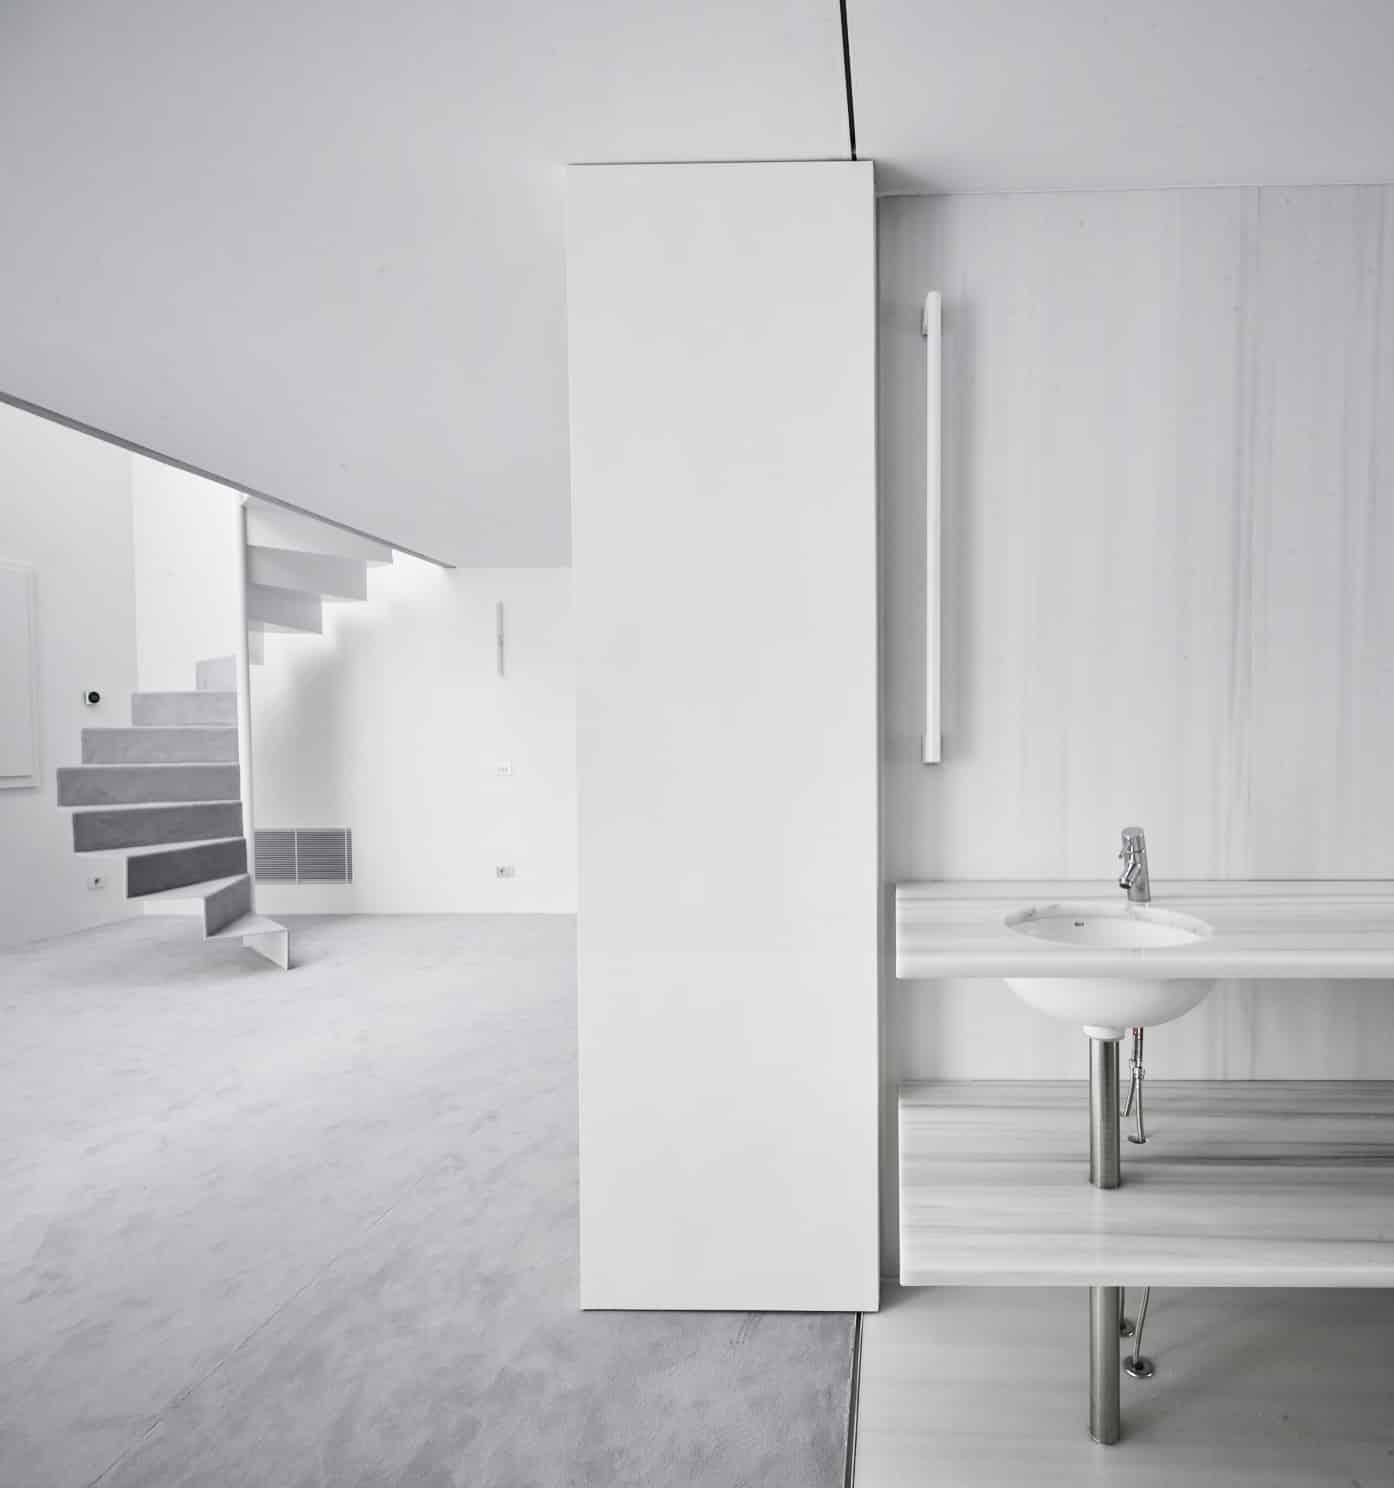 Casa Omar  - 00 ArquitecturaG CasaOmar 33